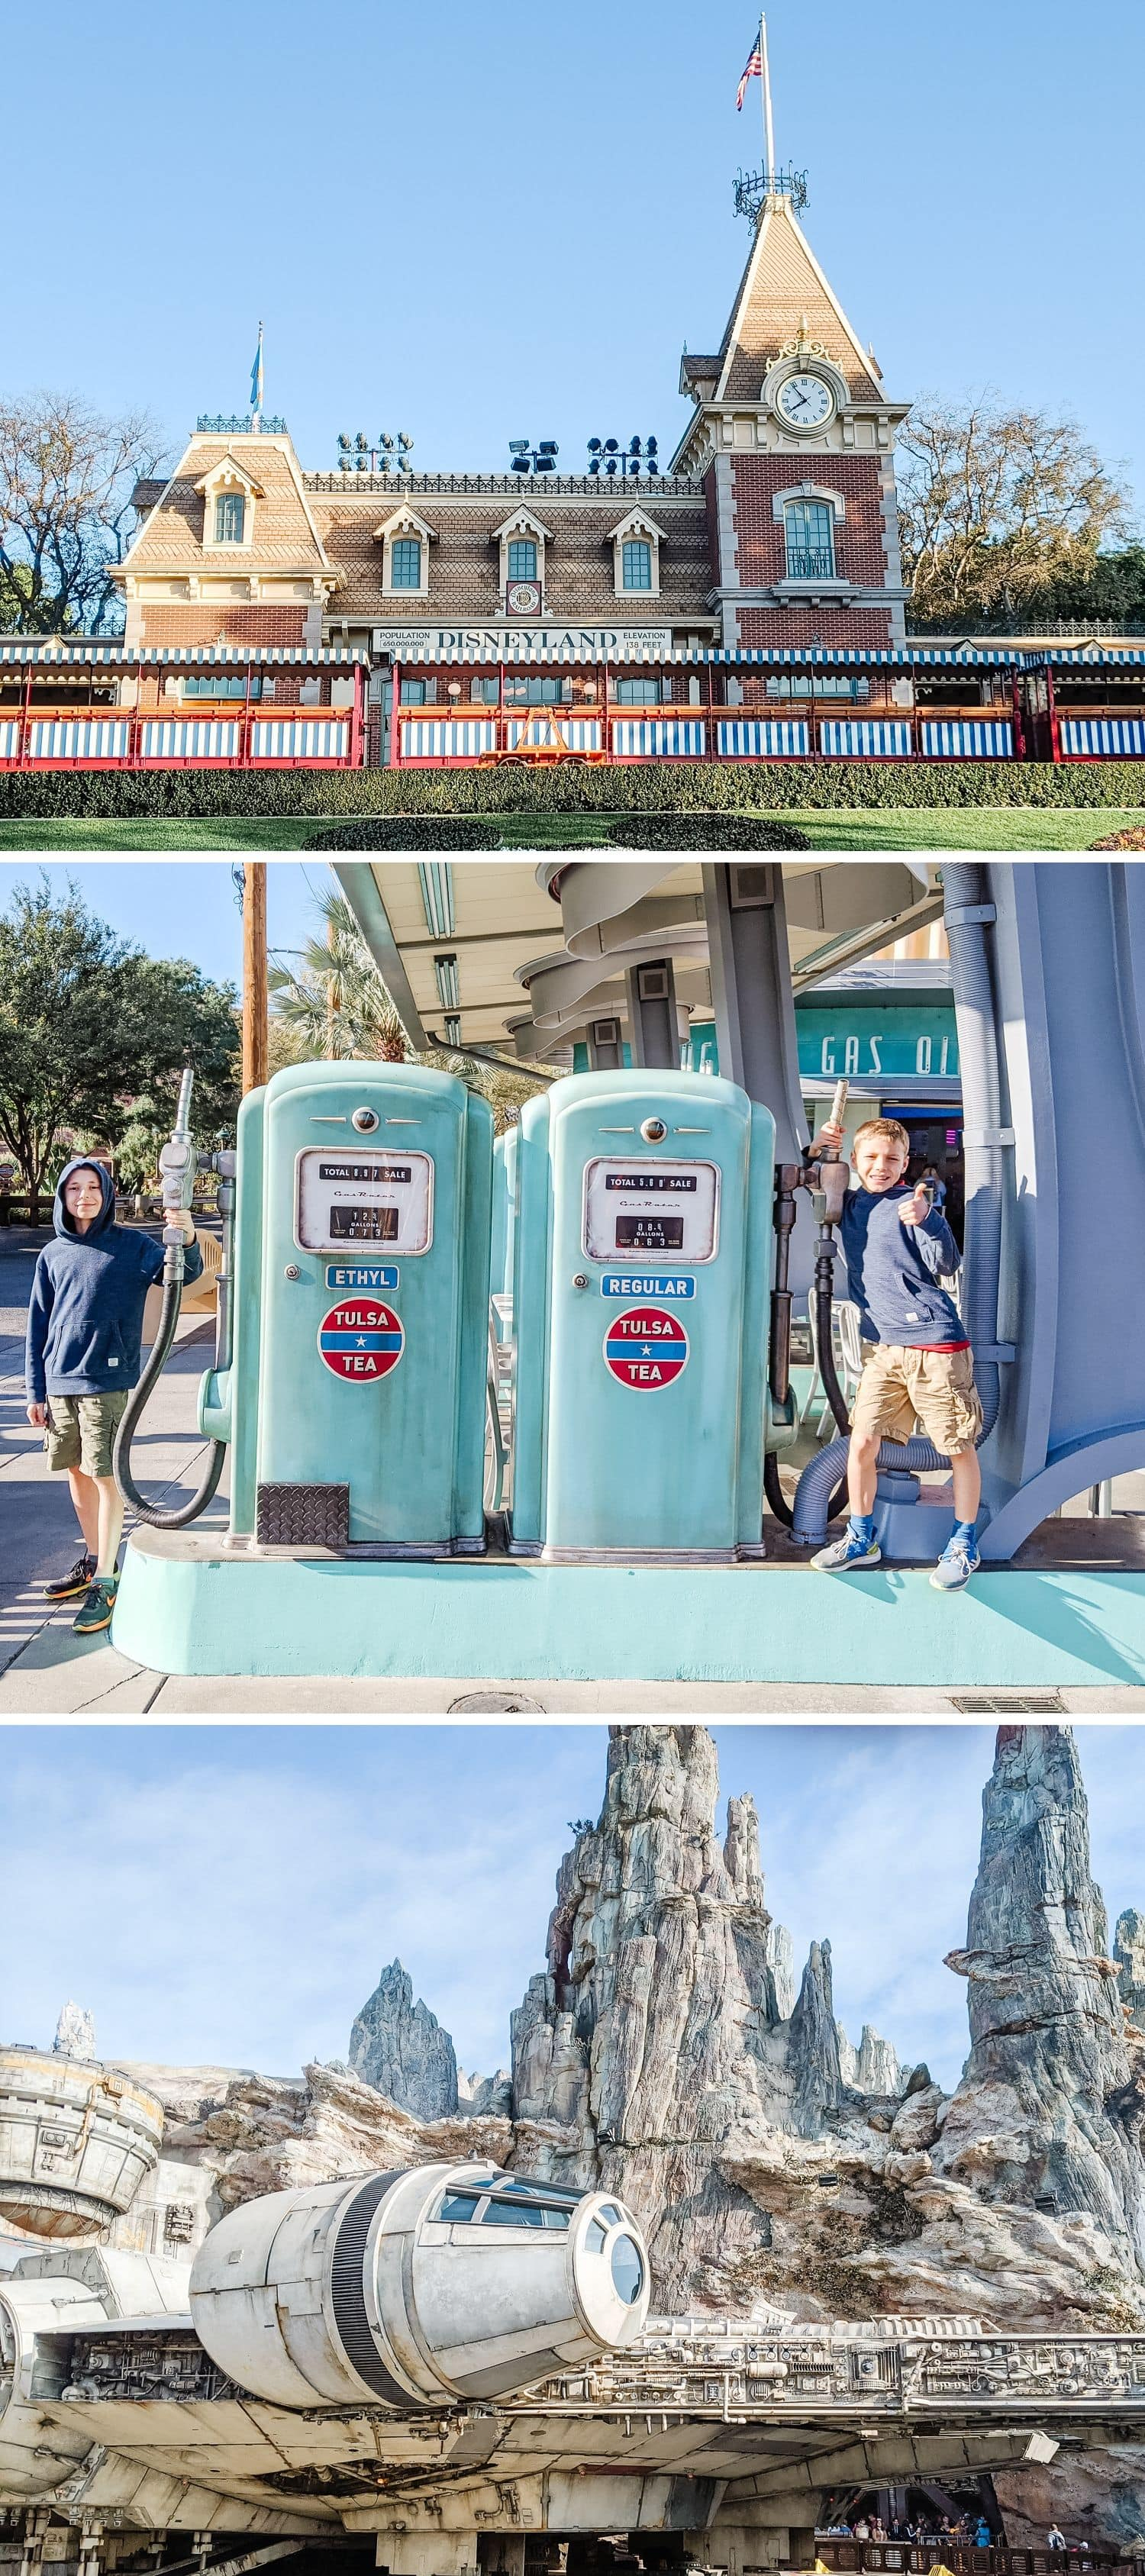 Collage of three Disneyland photos